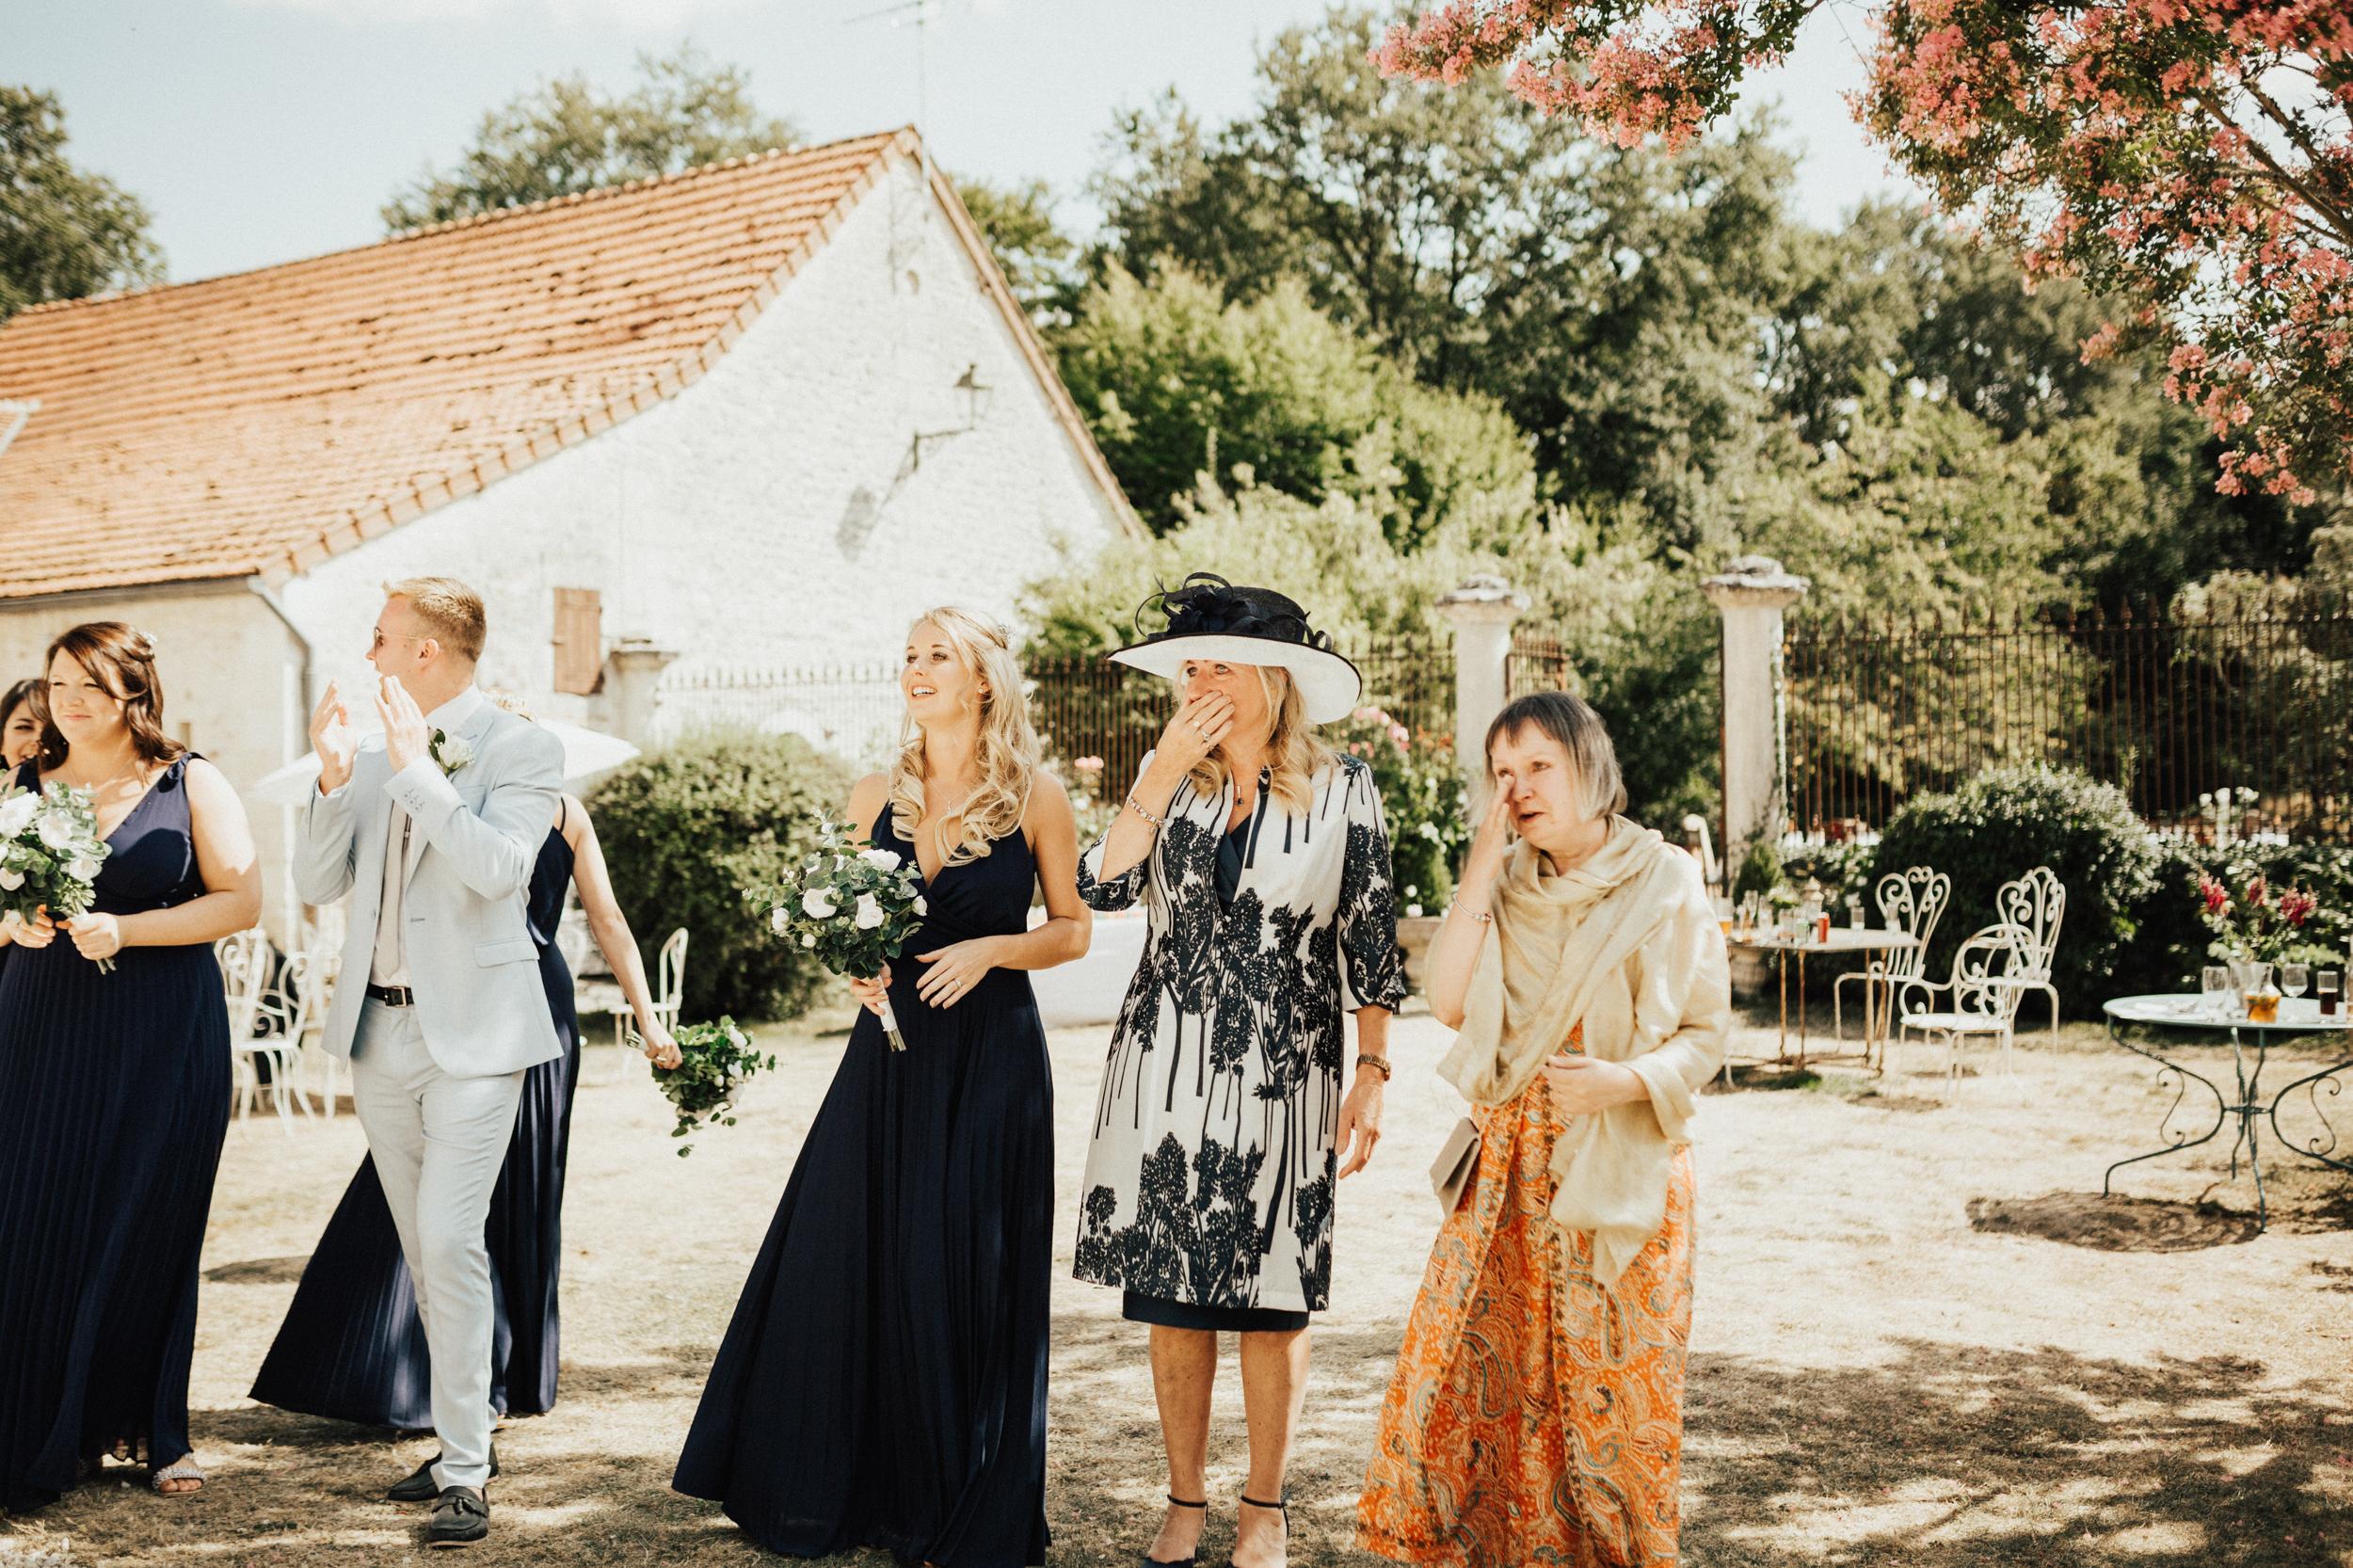 Amy-Zac-Destination-Wedding-France-Manoir-Foulquetiere-Darina-Stoda-Photography-36.jpg